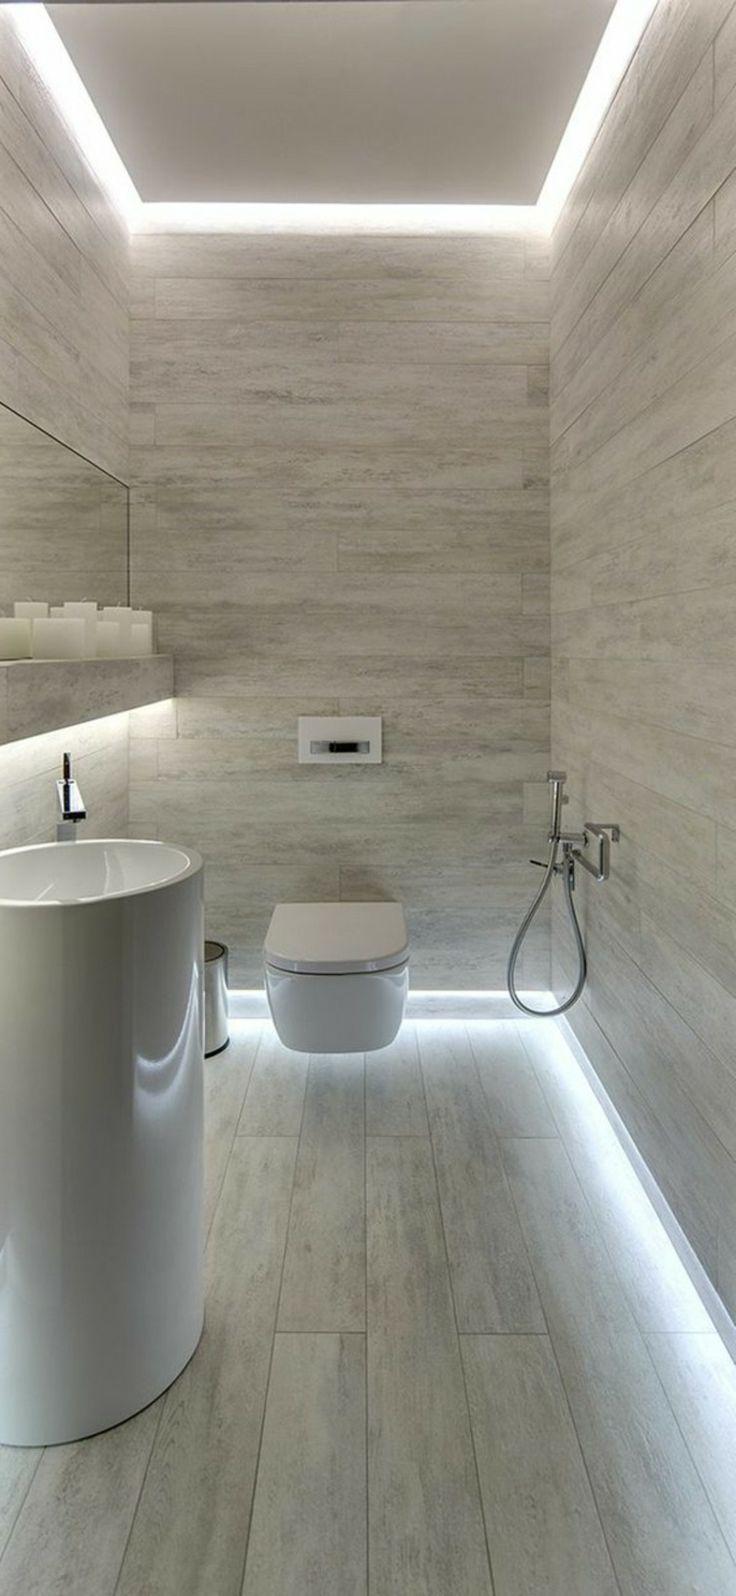 Angenehme Atmosphare Durch Indirekte Beleuchtung Led Beleuchtung Zenideen Indirekte Beleuchtung Led Badezimmereinrichtung Indirekte Beleuchtung